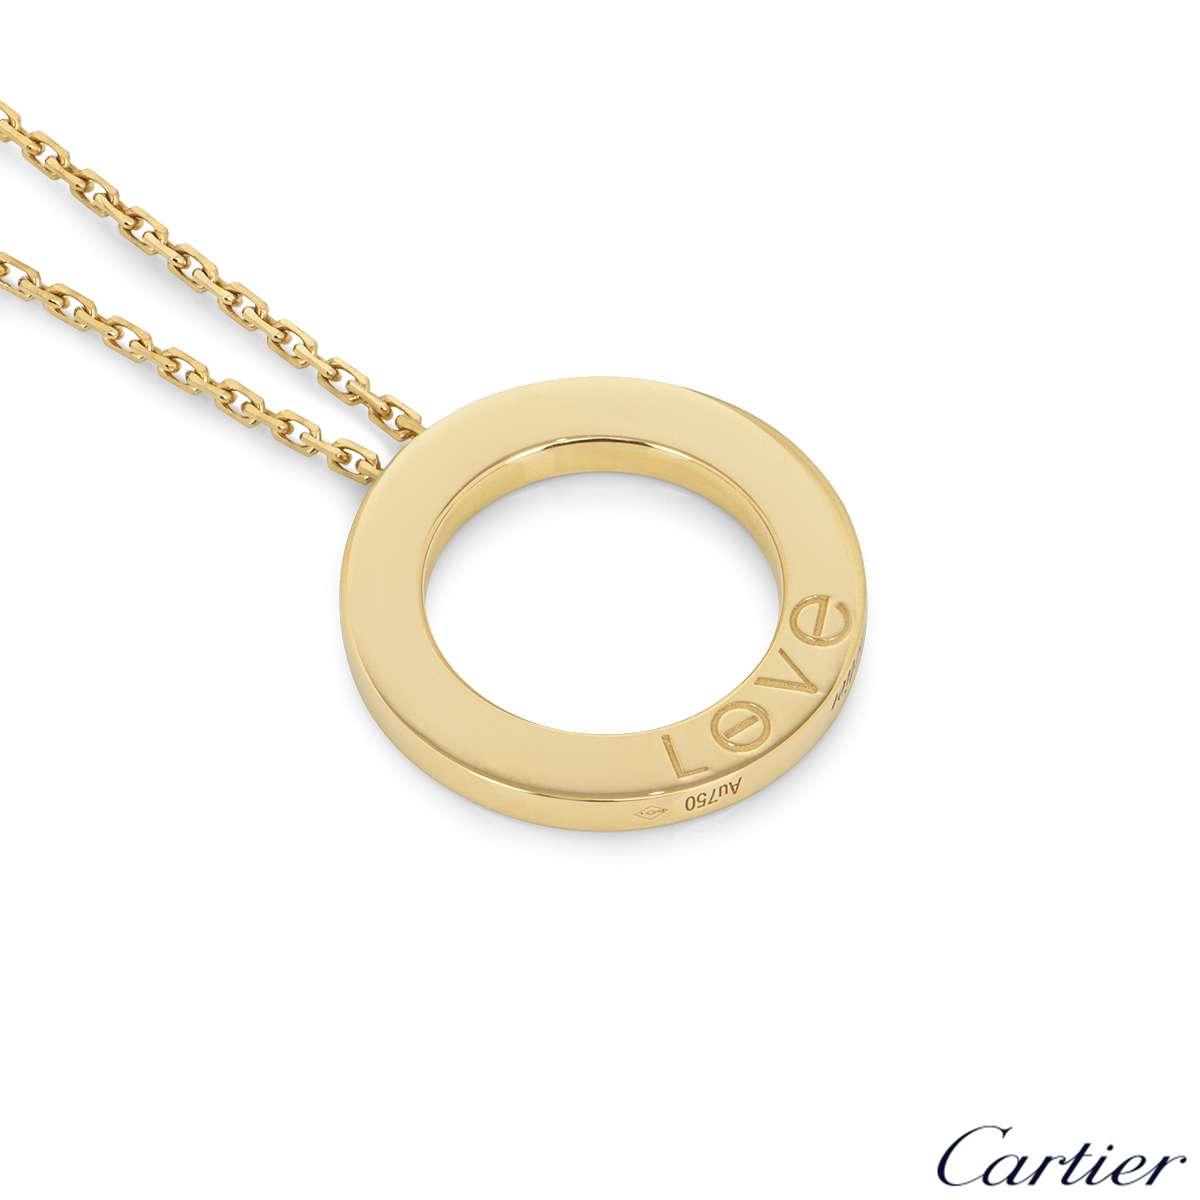 Cartier Yellow Gold 3 Diamond Love Necklace B7014500